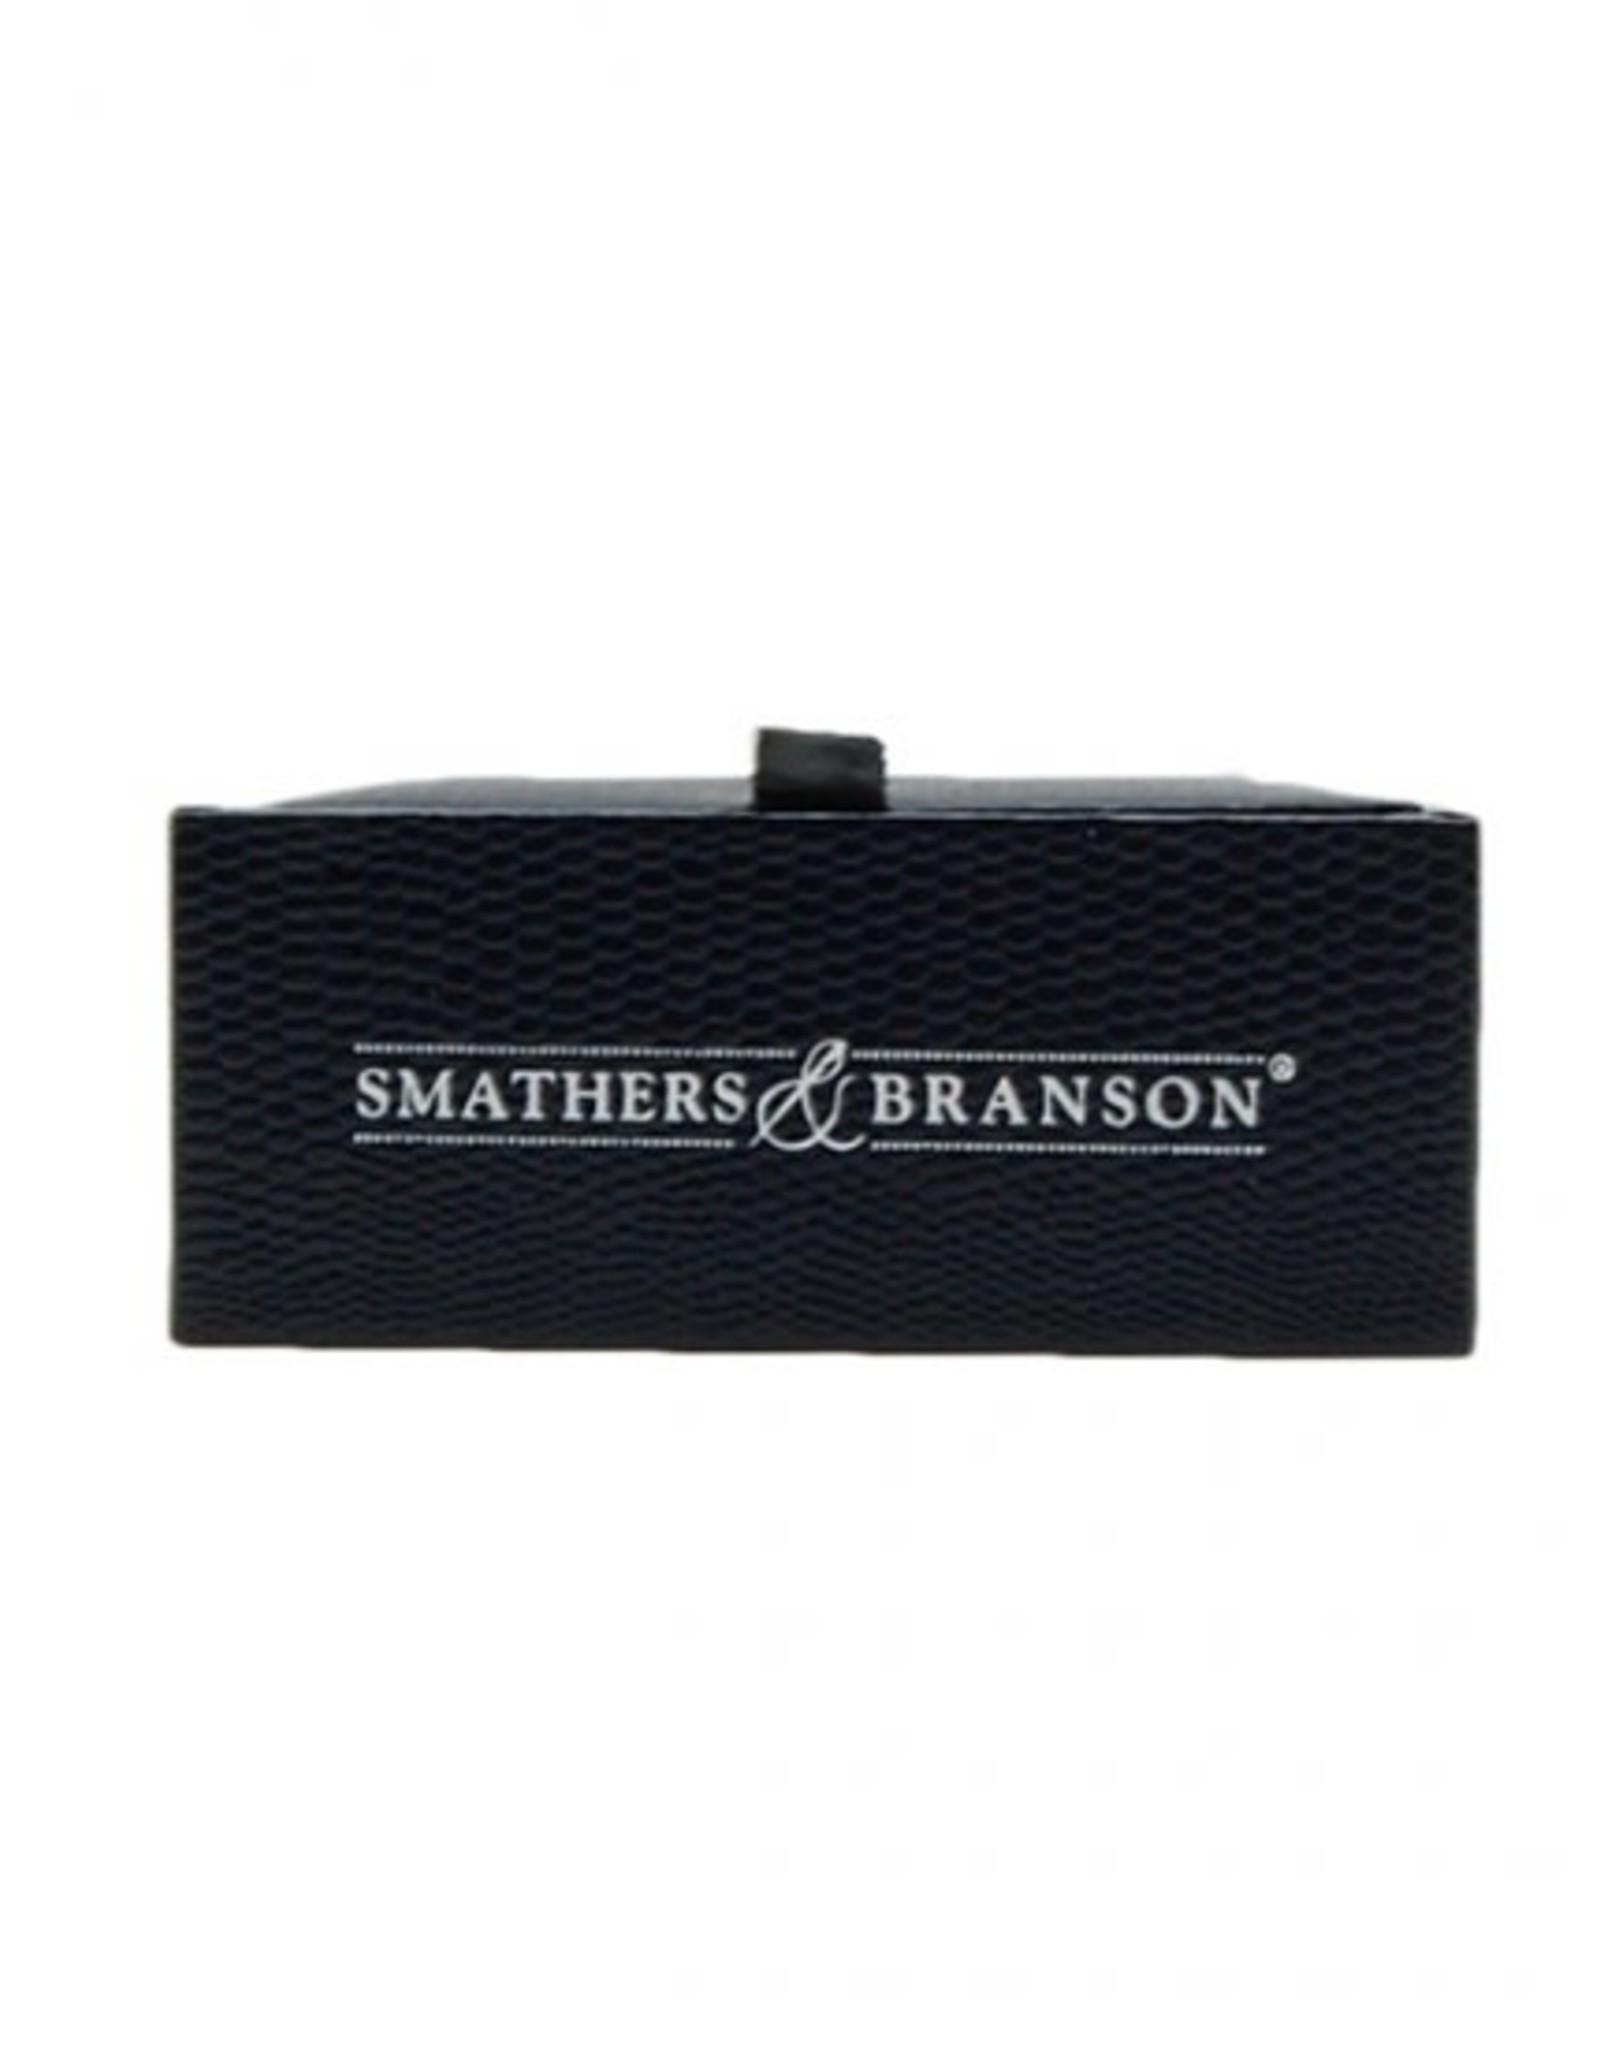 Smather's & Branson Cuff Links Dancing Bears